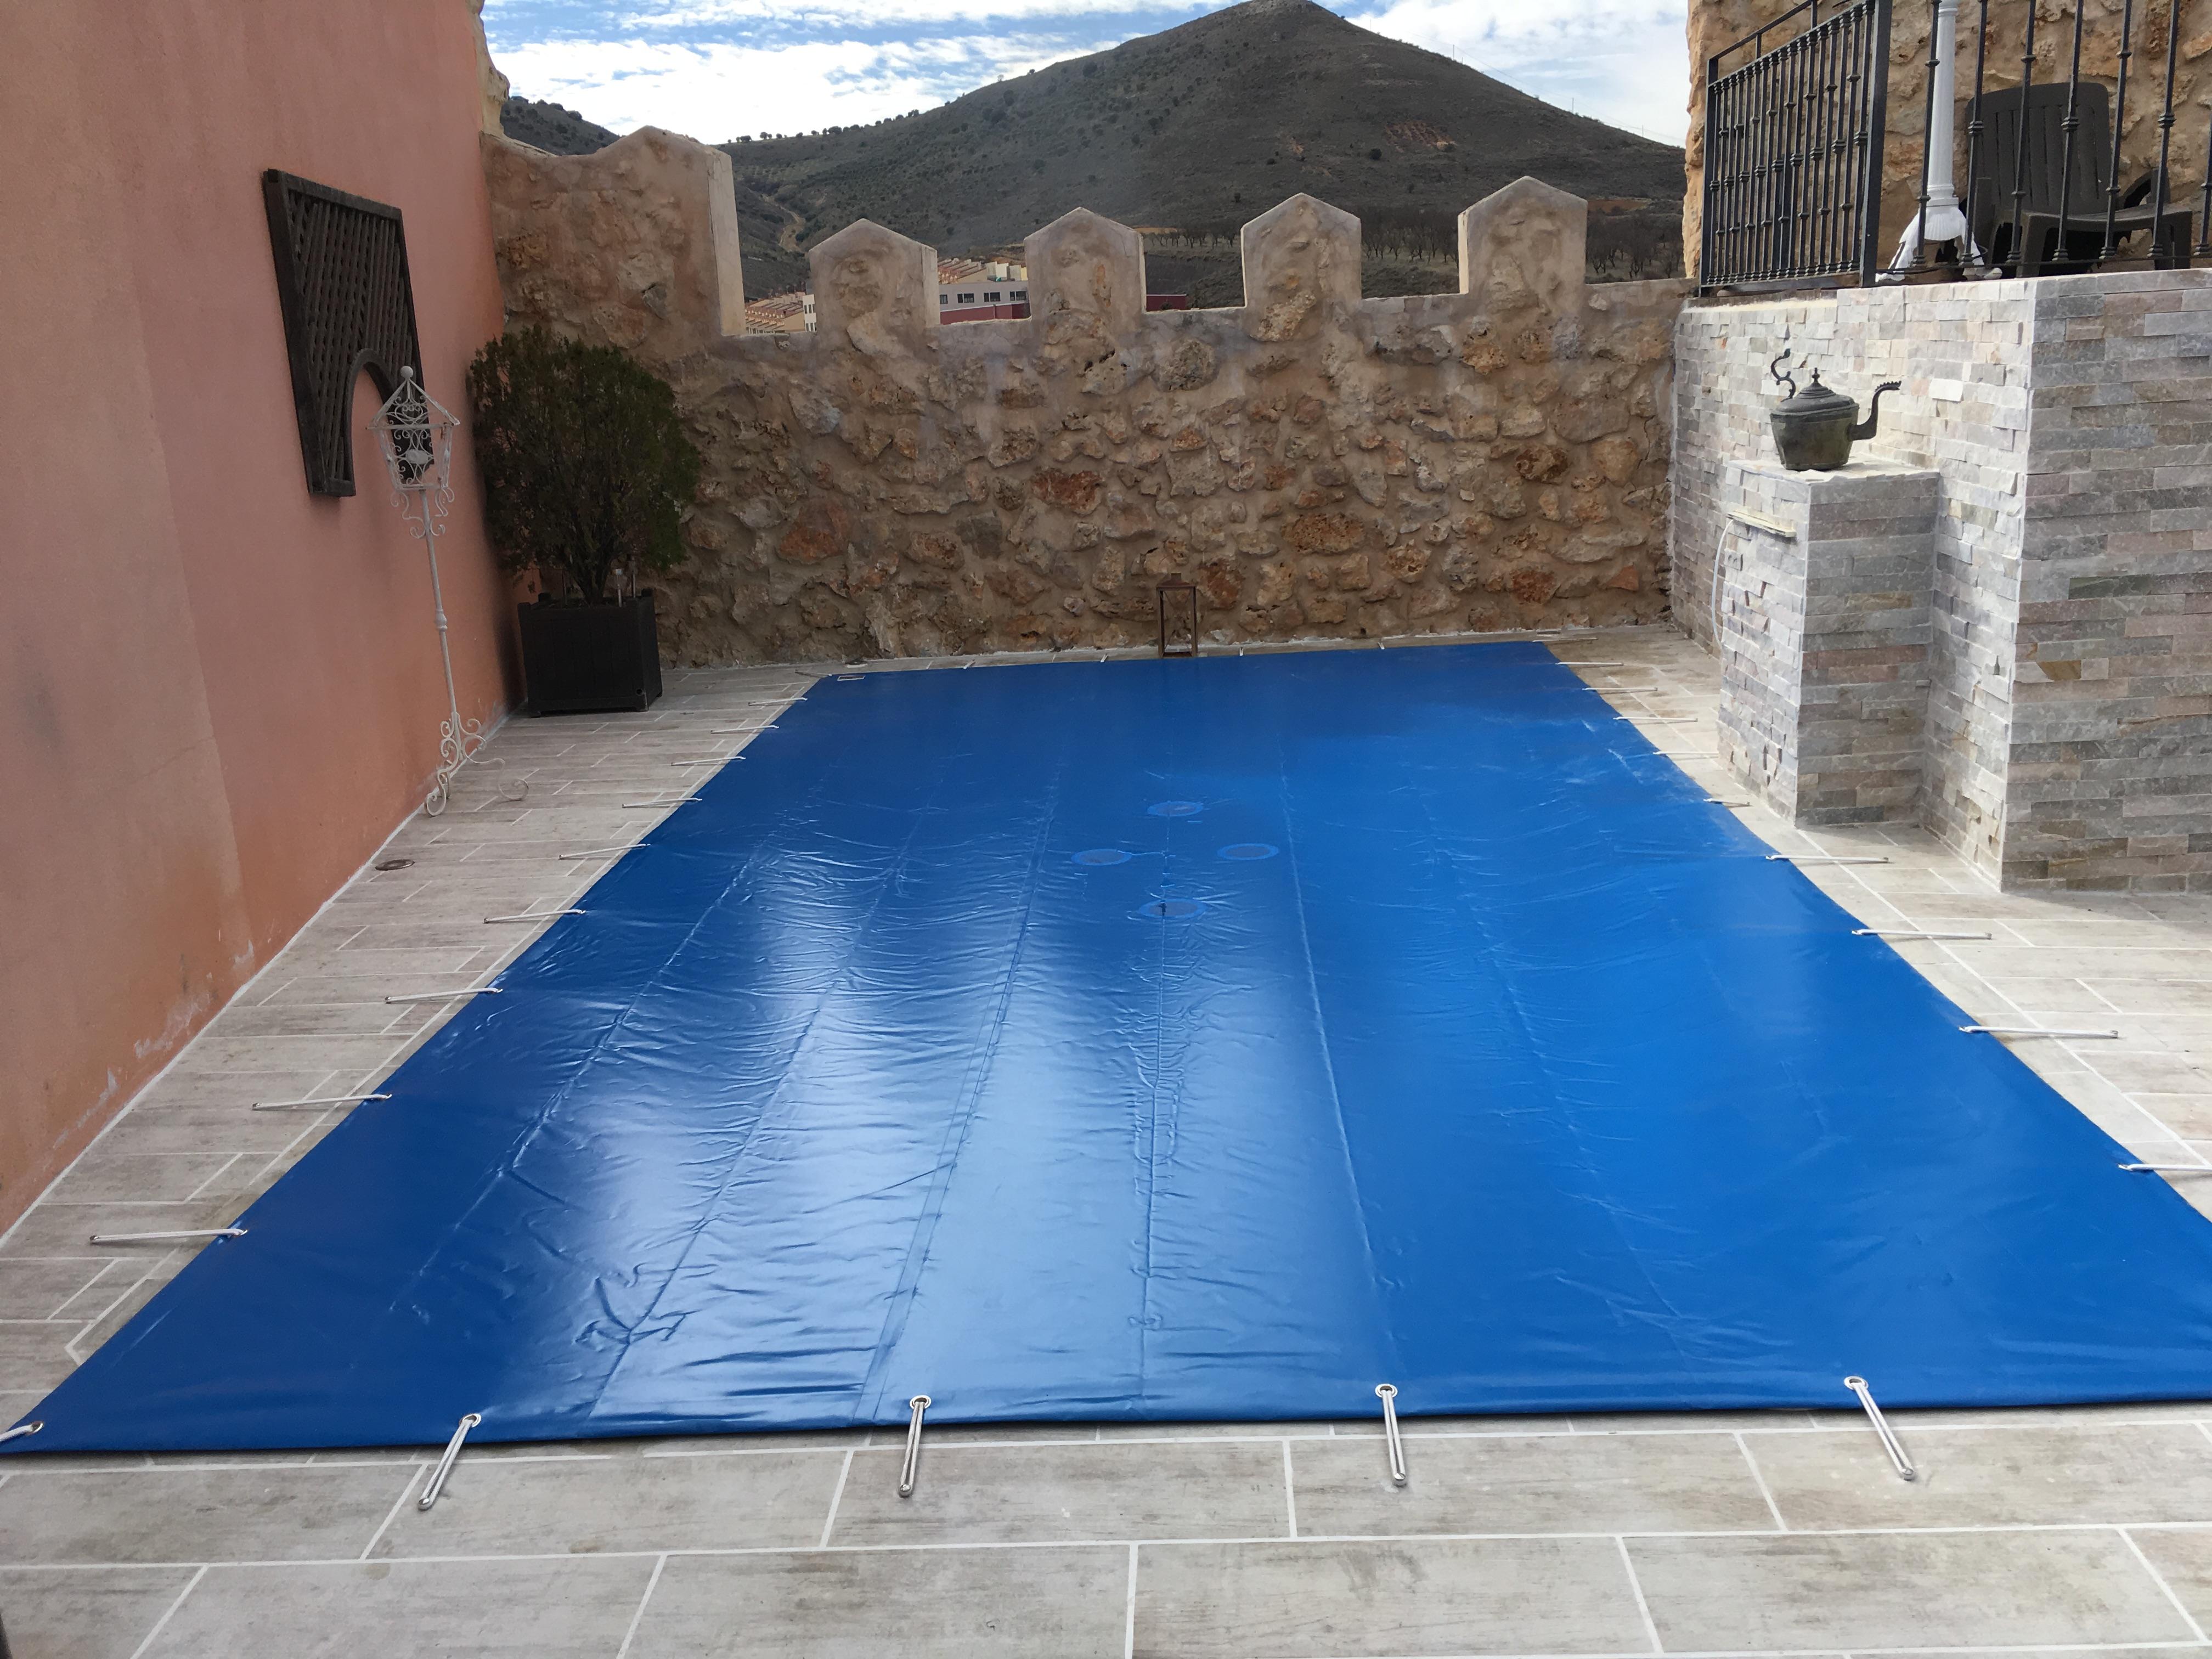 piscina lona exterior